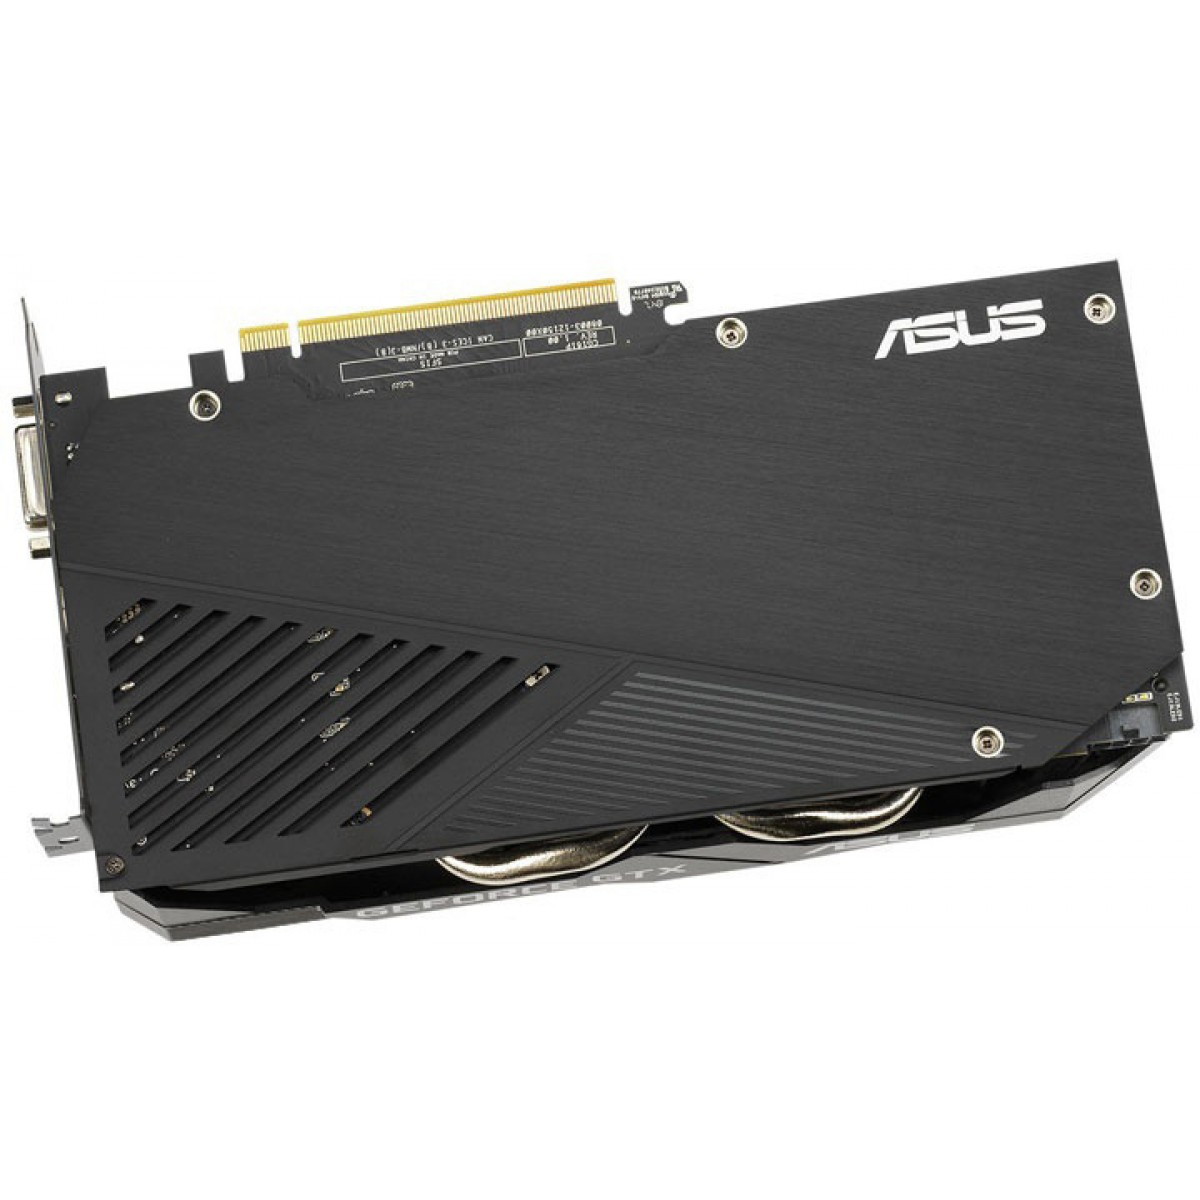 Placa de Vídeo Asus GeForce GTX 1660 Ti OC, 6GB GDDR6, 192Bits, DUAL-GTX1660TI-O6G-EVO